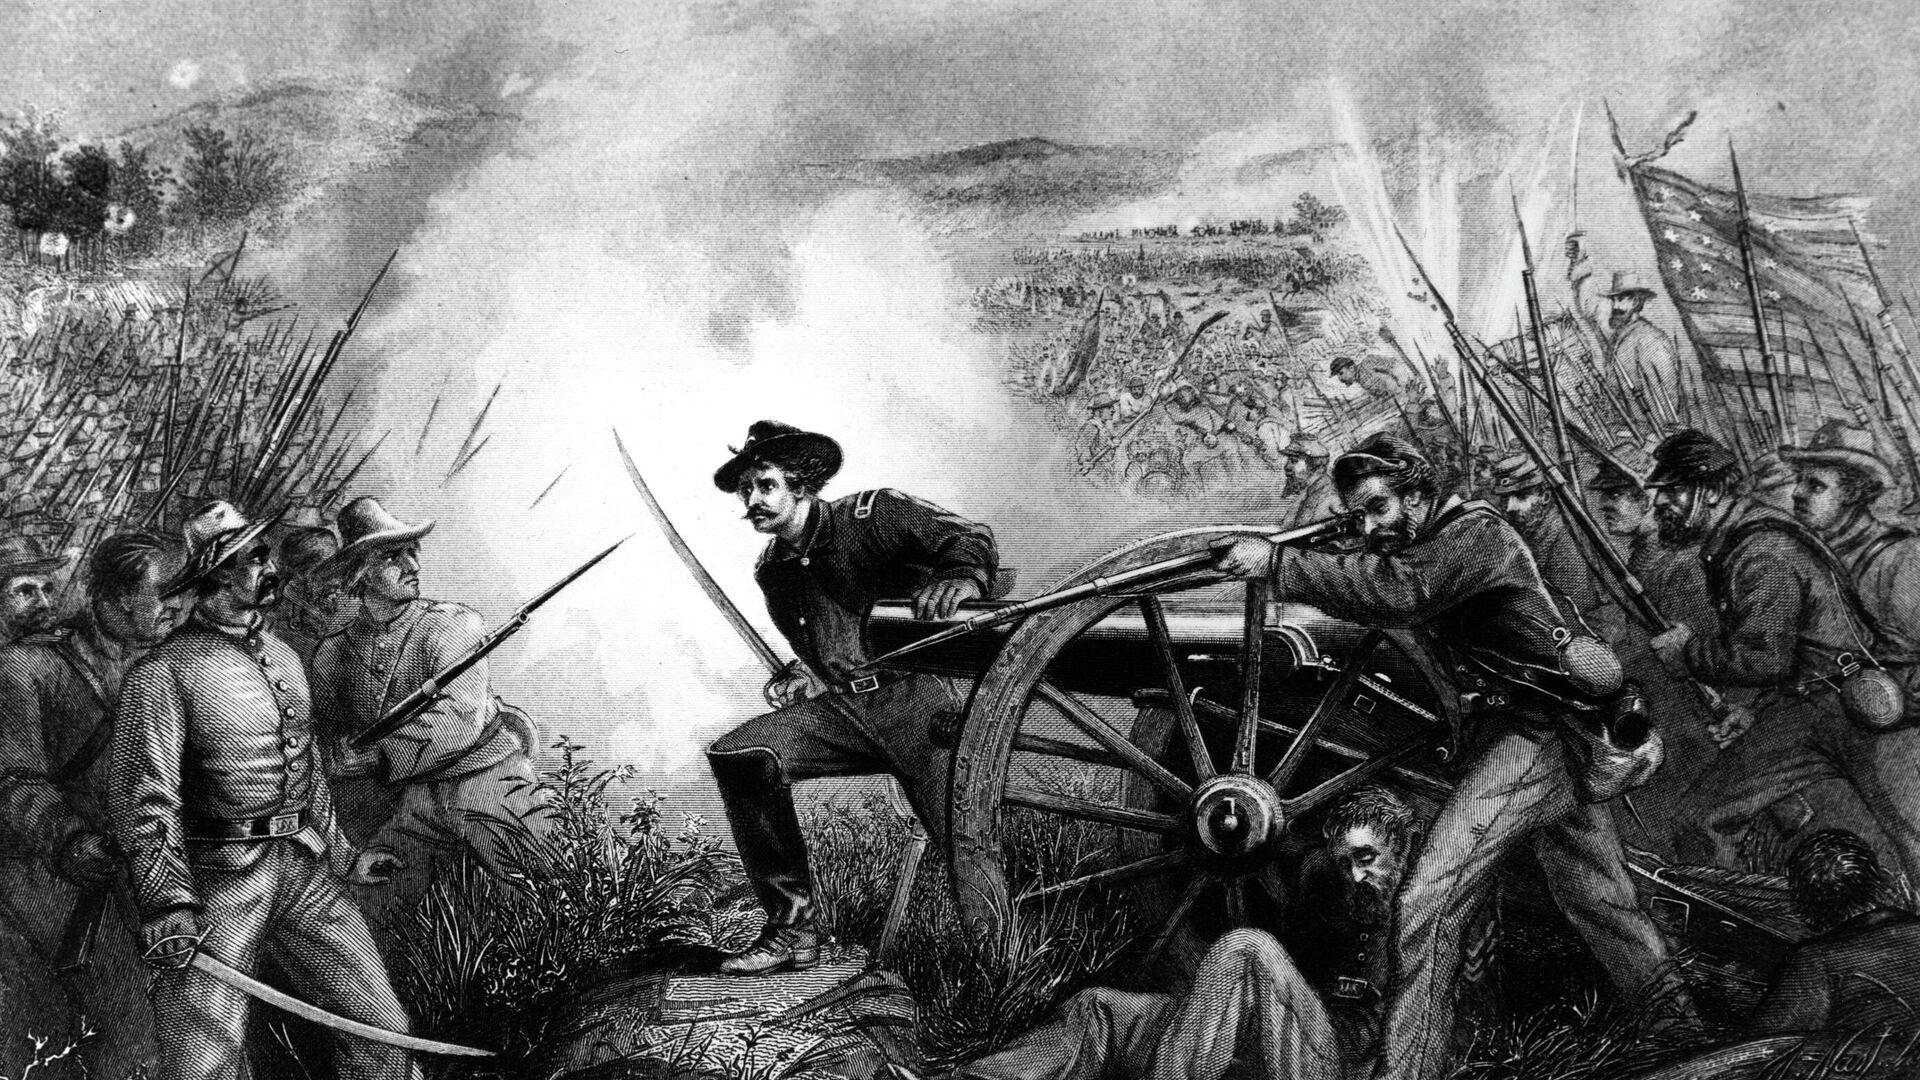 Guerra civil estadounidense - Sputnik Mundo, 1920, 12.04.2021